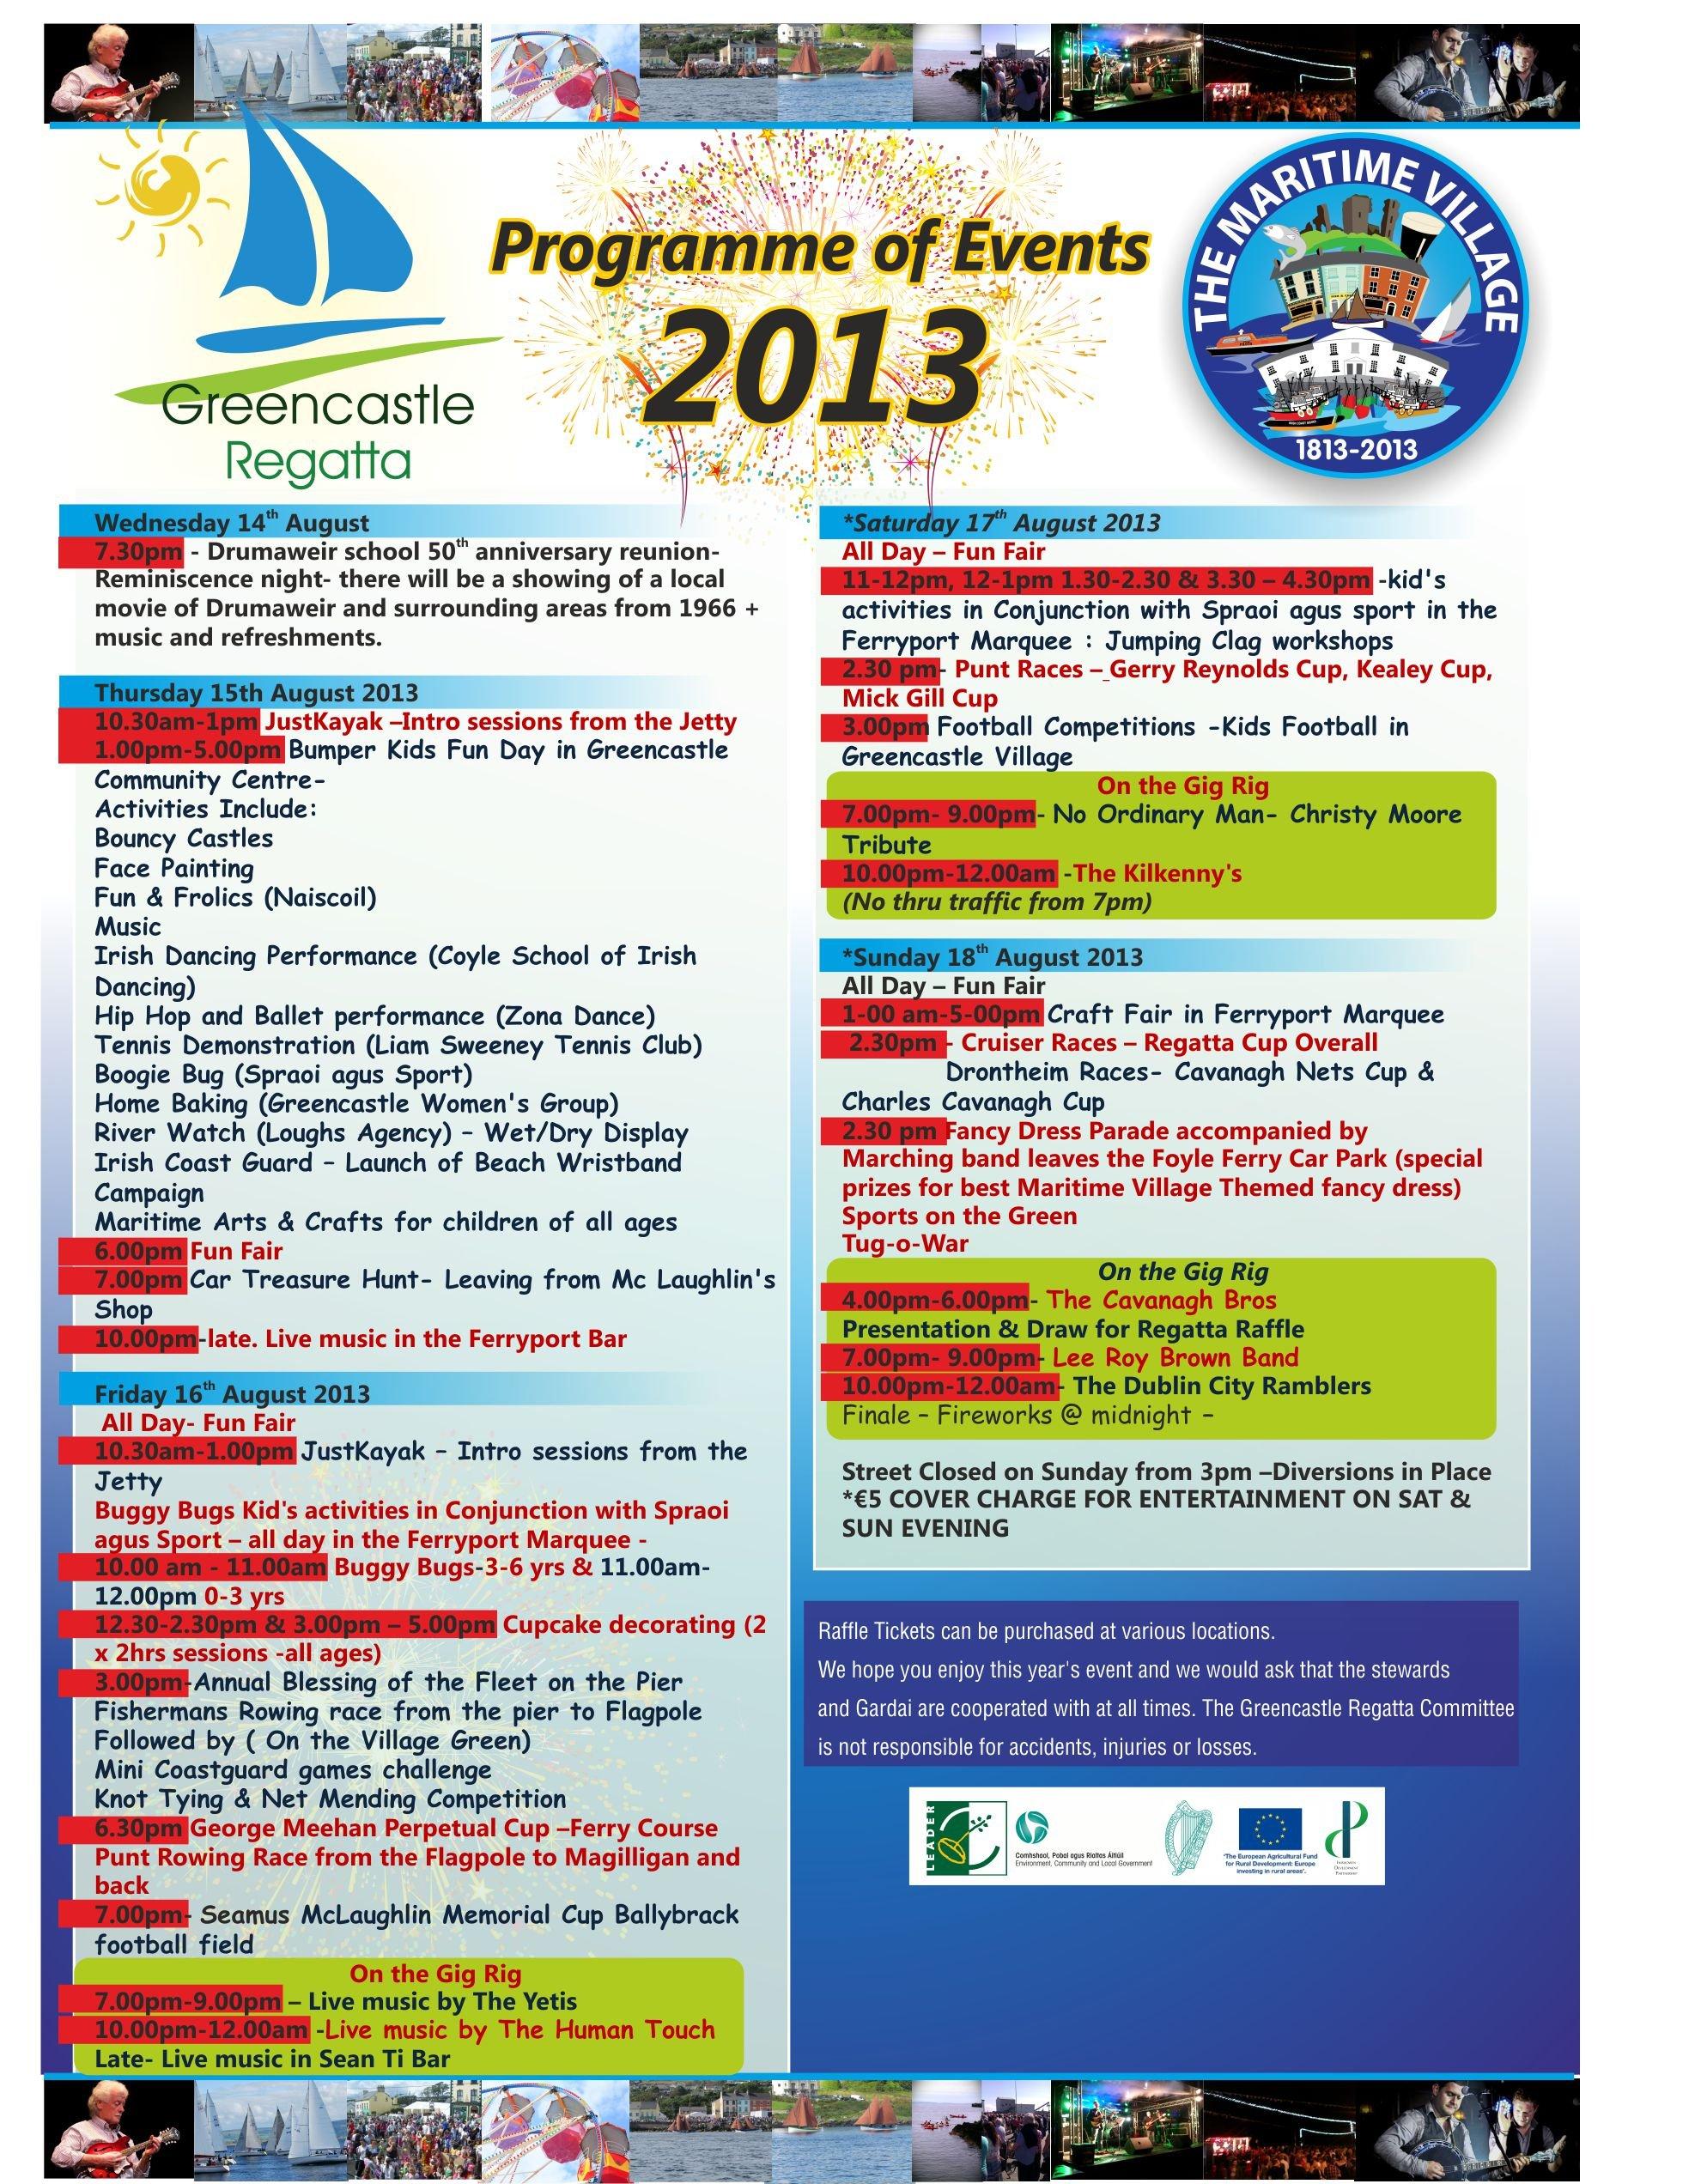 Greencastle Regatta Programme